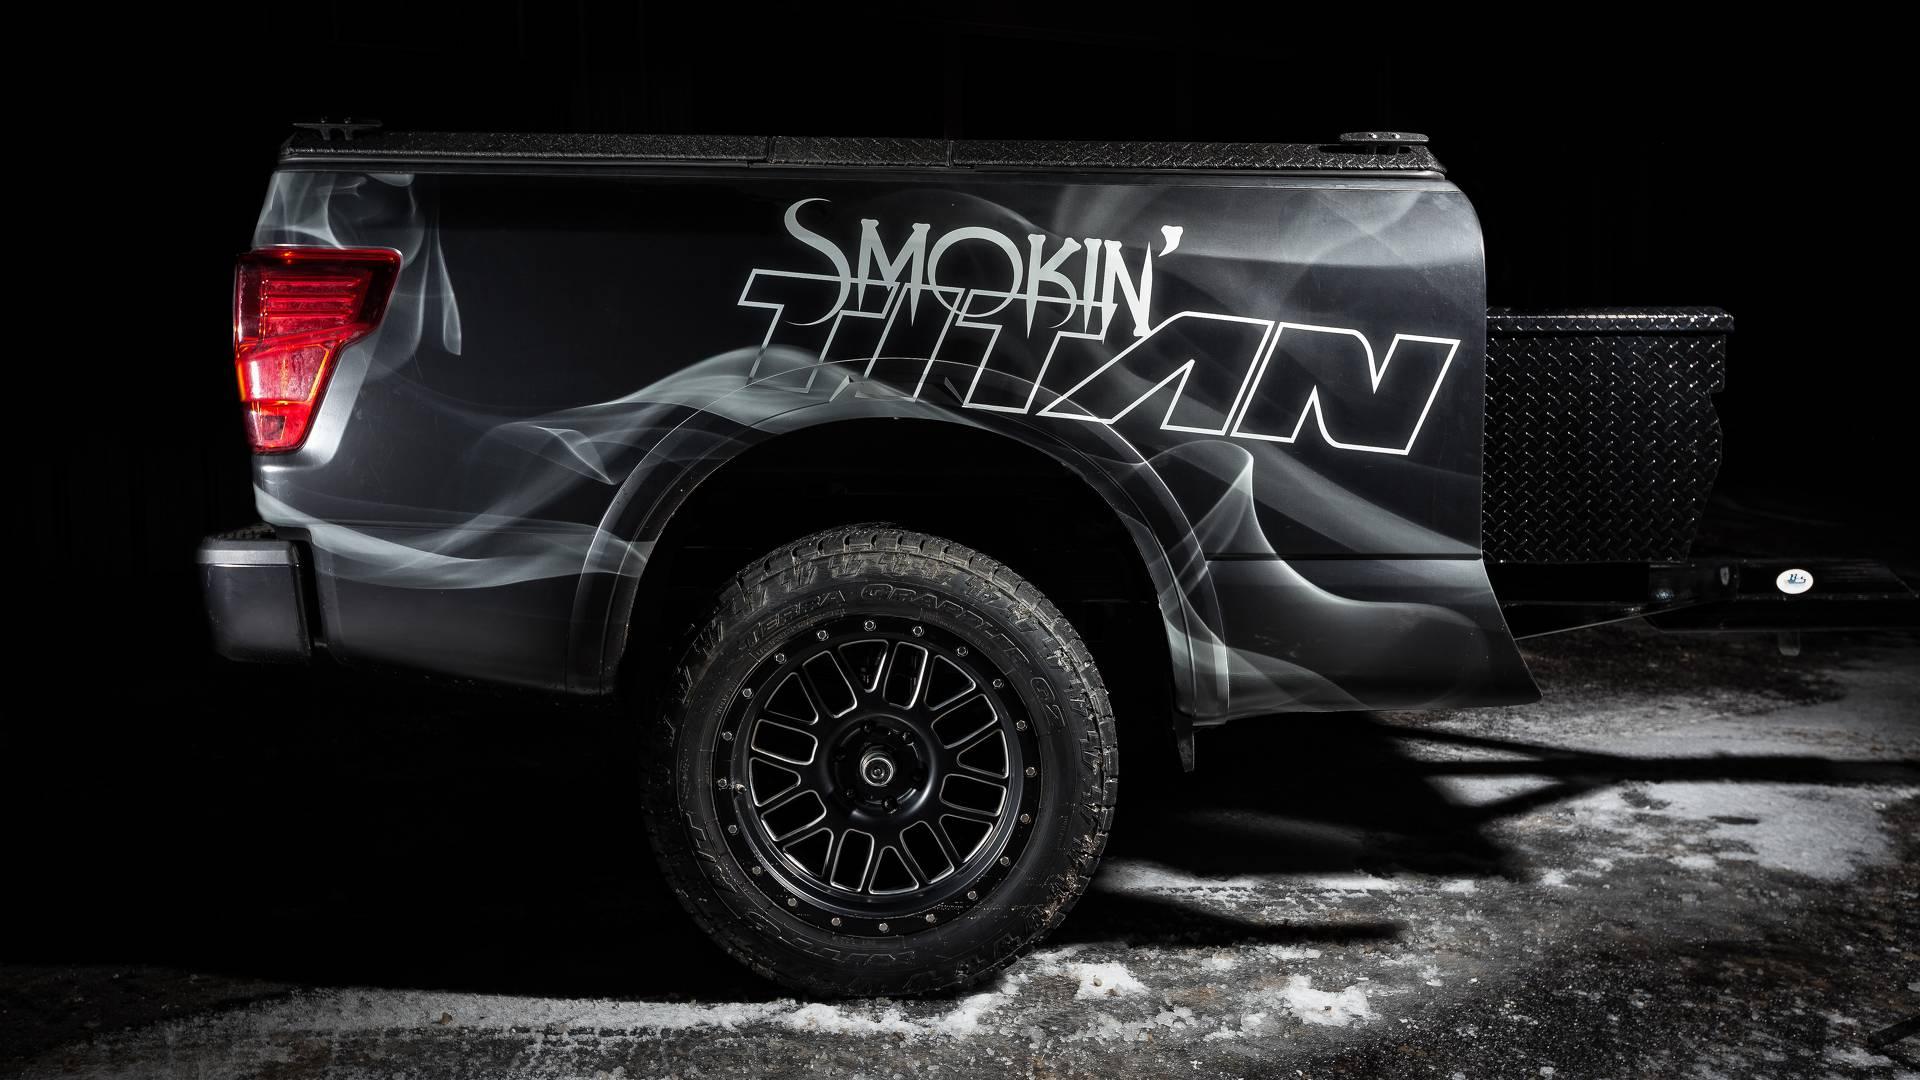 nissan-smokin-titan (4)